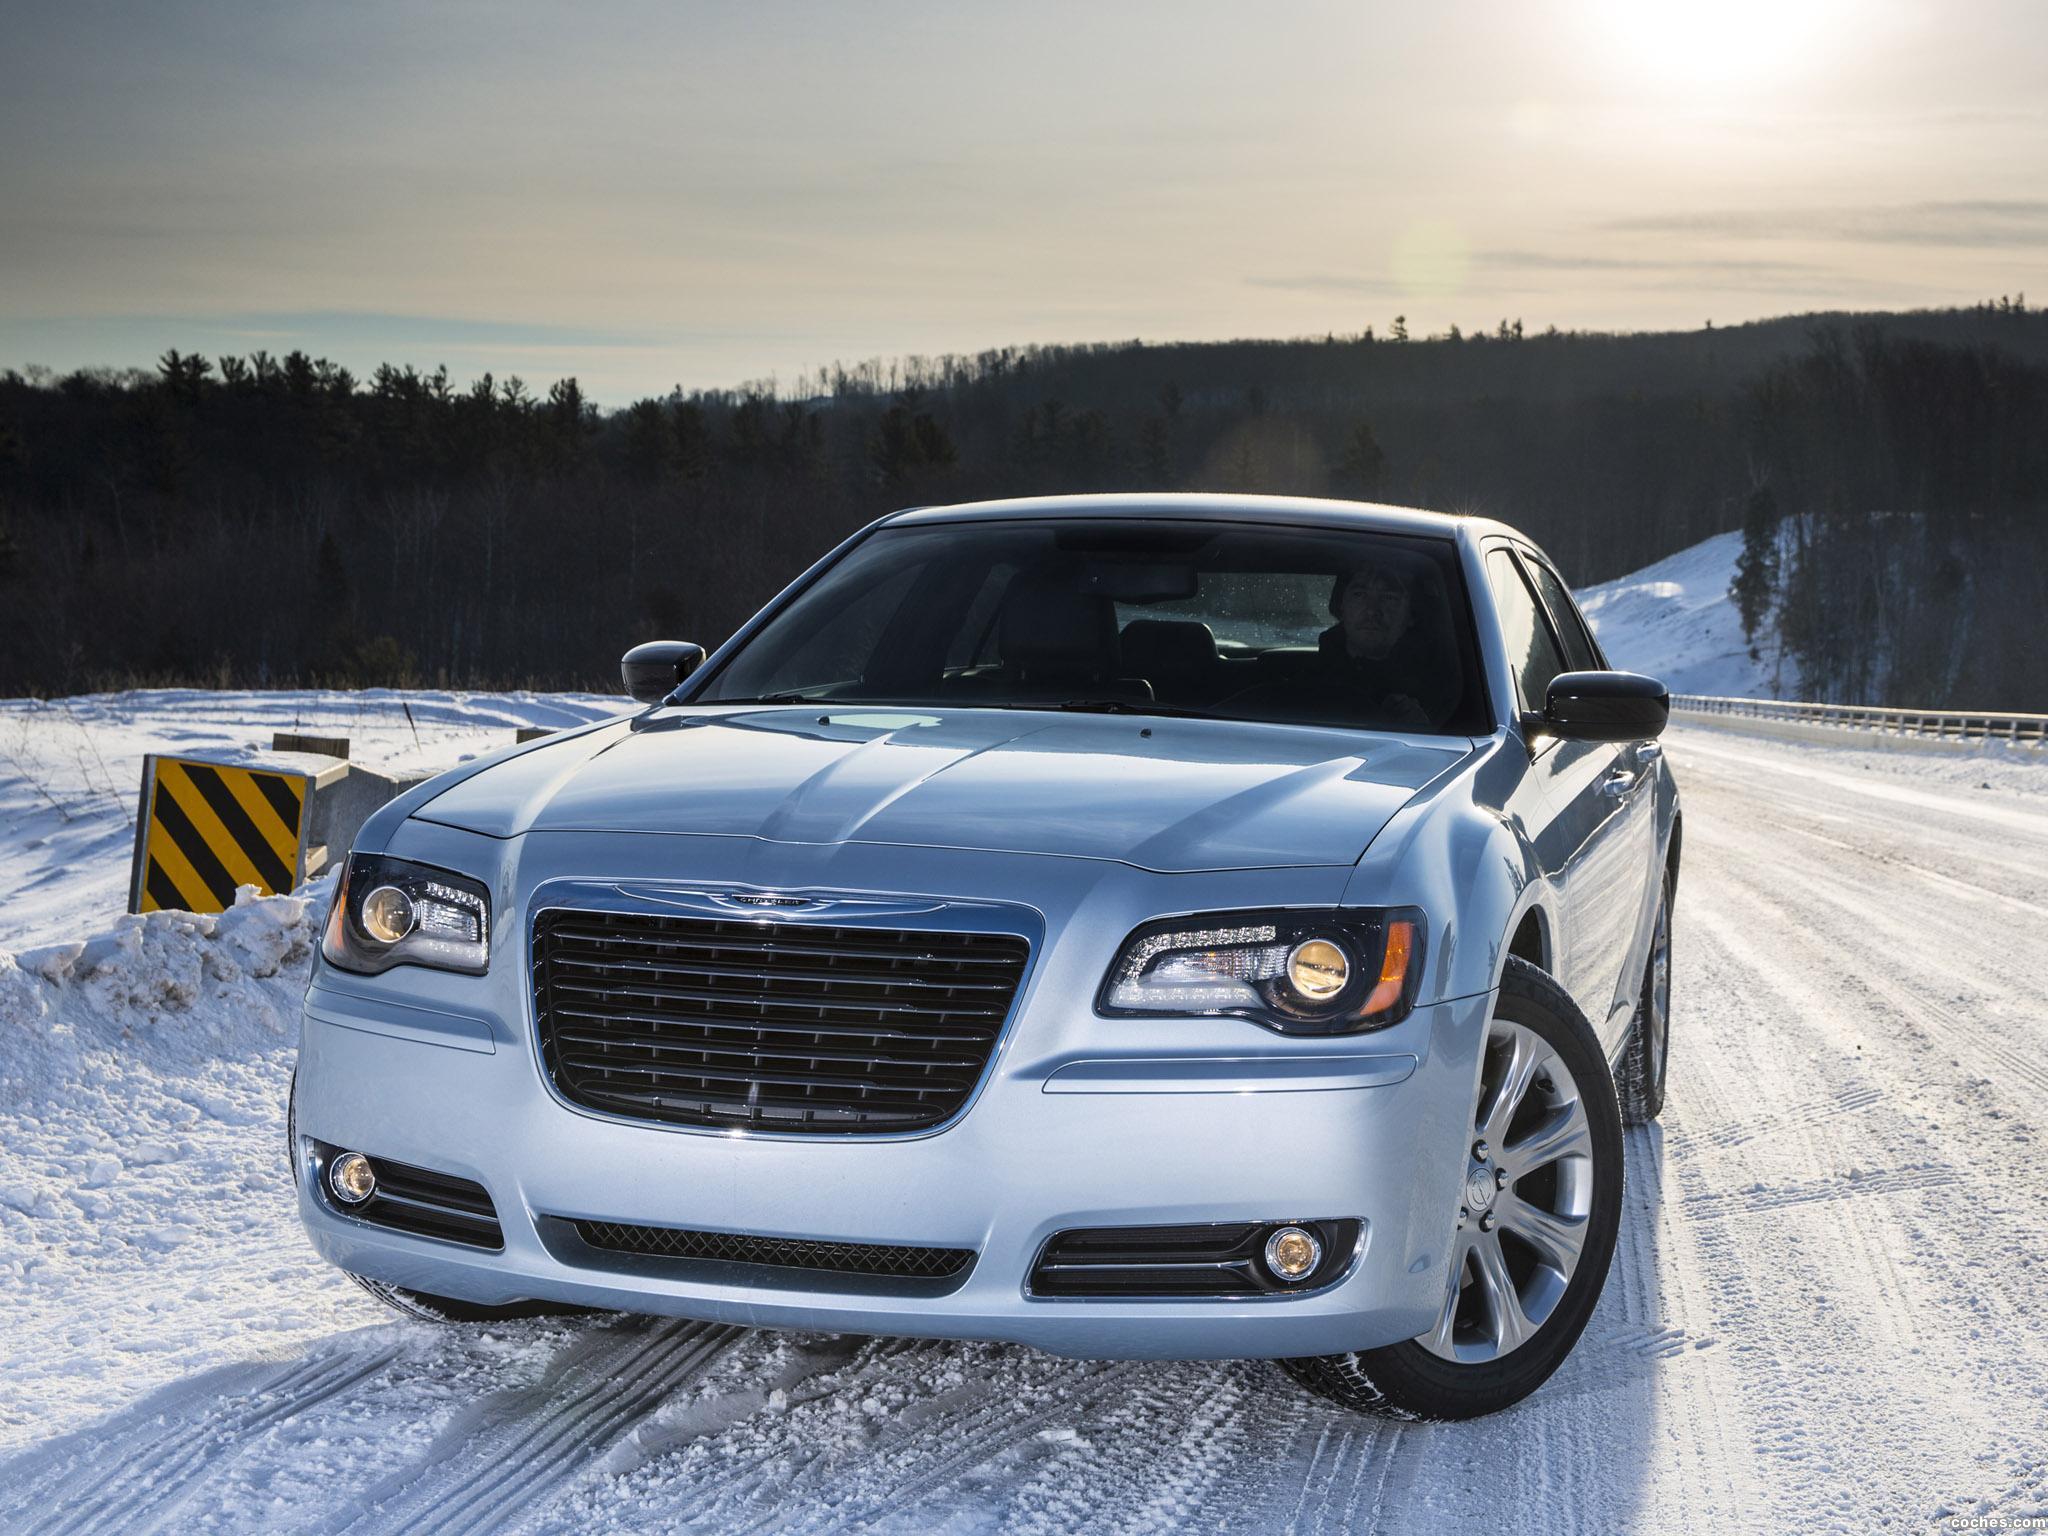 Foto 0 de Chrysler 300 Glacier 2013